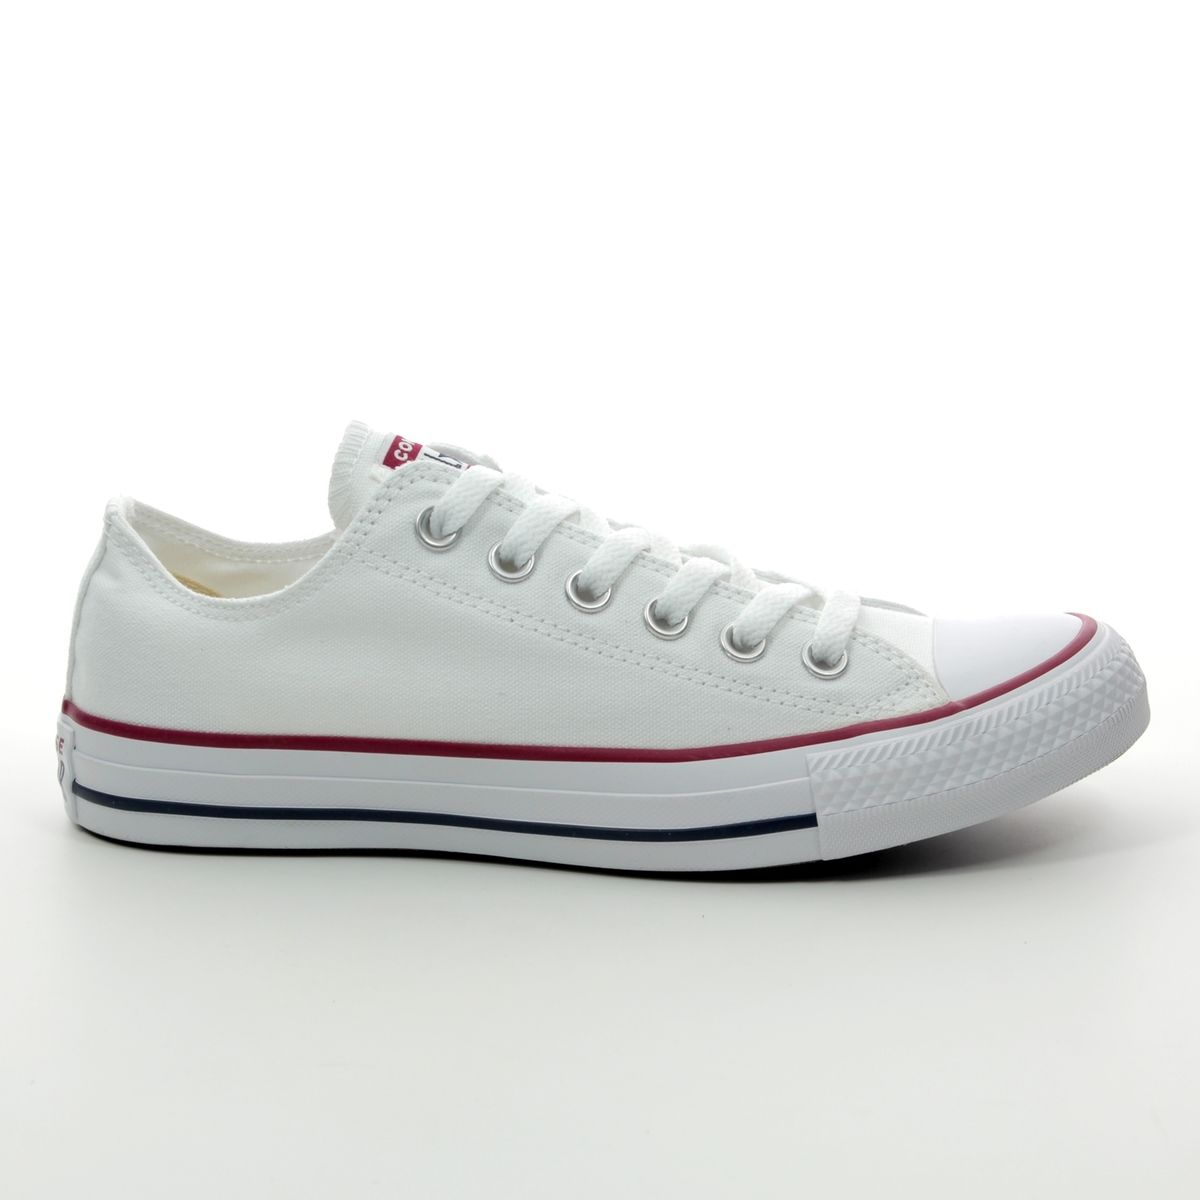 4a3cb353c5a5 Converse Trainers - White - M7652C All Star Ox Classic